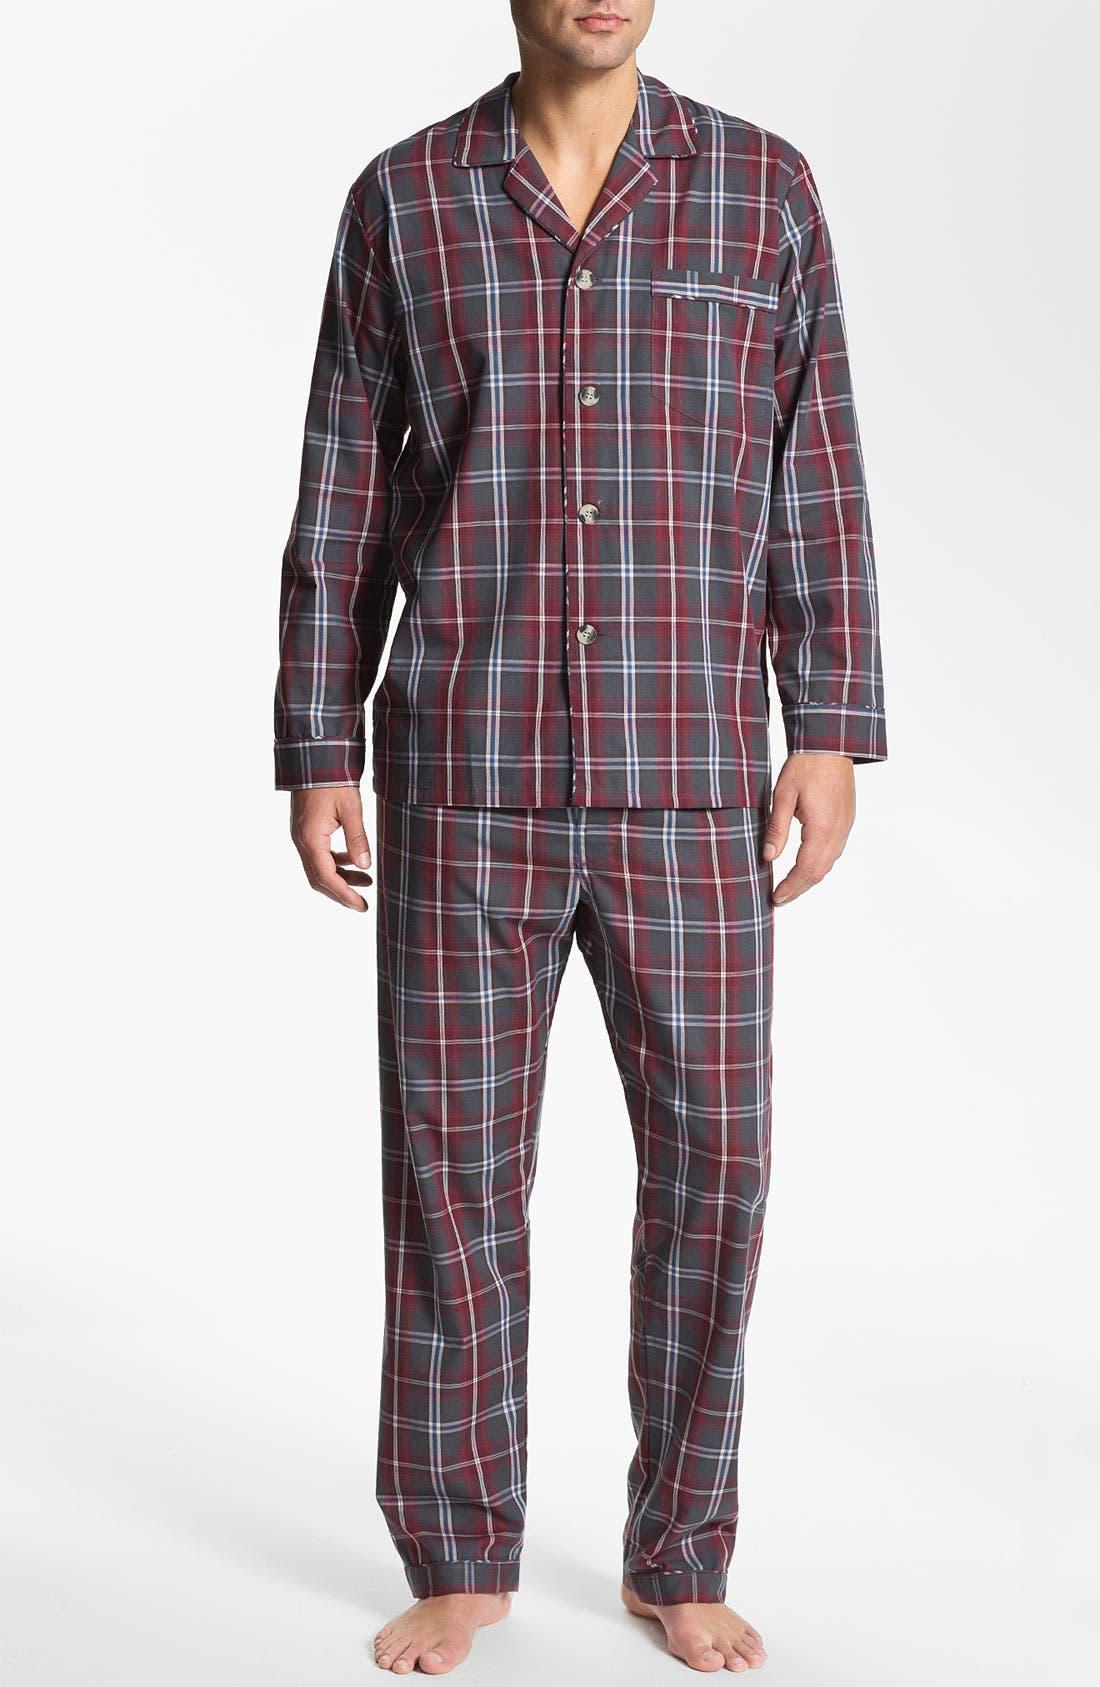 Alternate Image 1 Selected - Majestic Plaid Easy Care Pajama Set (Big & Tall)